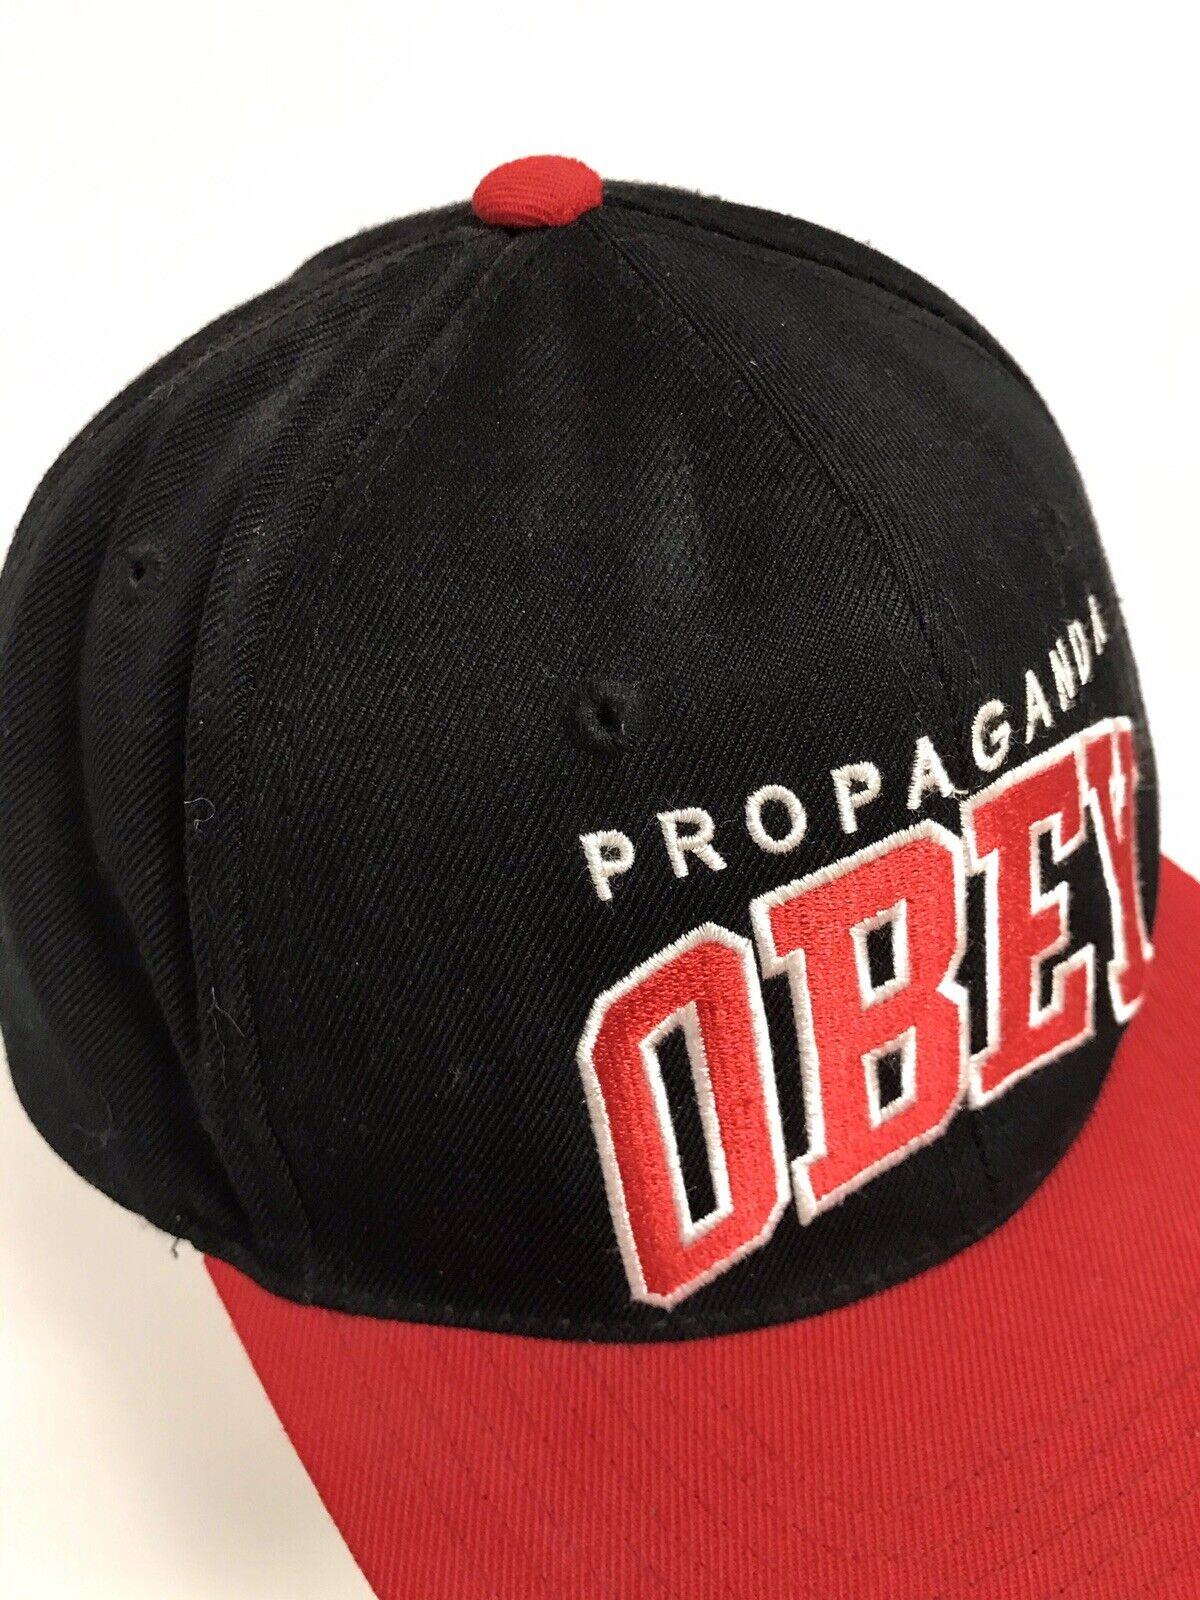 Propaganda Obey Red Black Snapback Hat - image 2